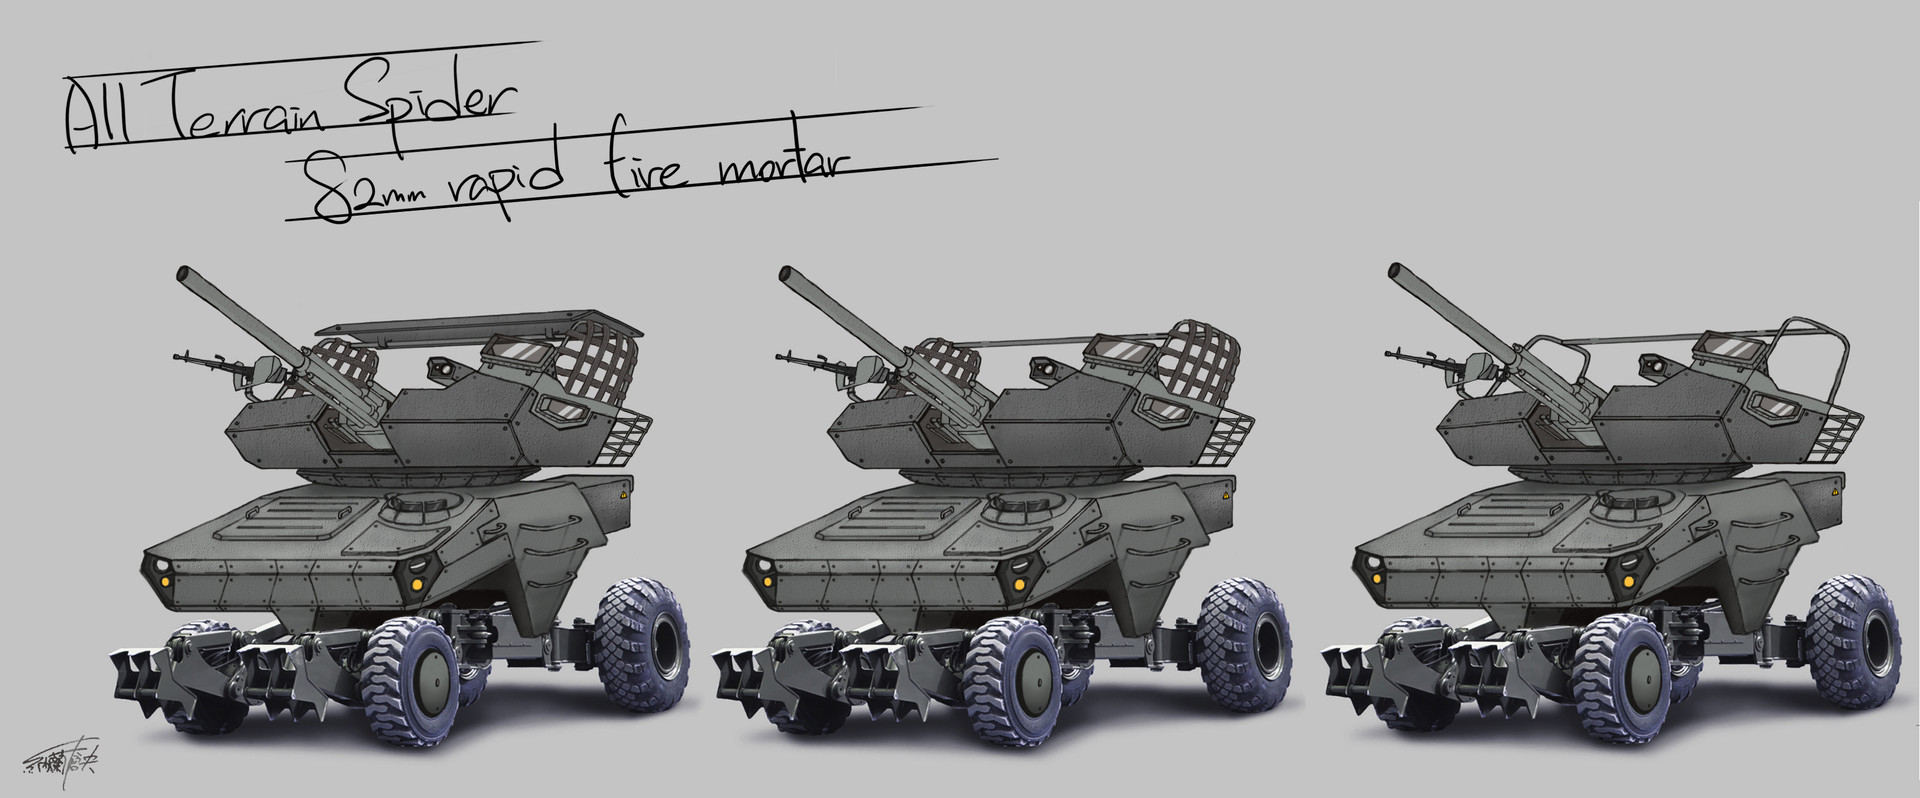 All Terrain Spider 82mm rapid fire mortar